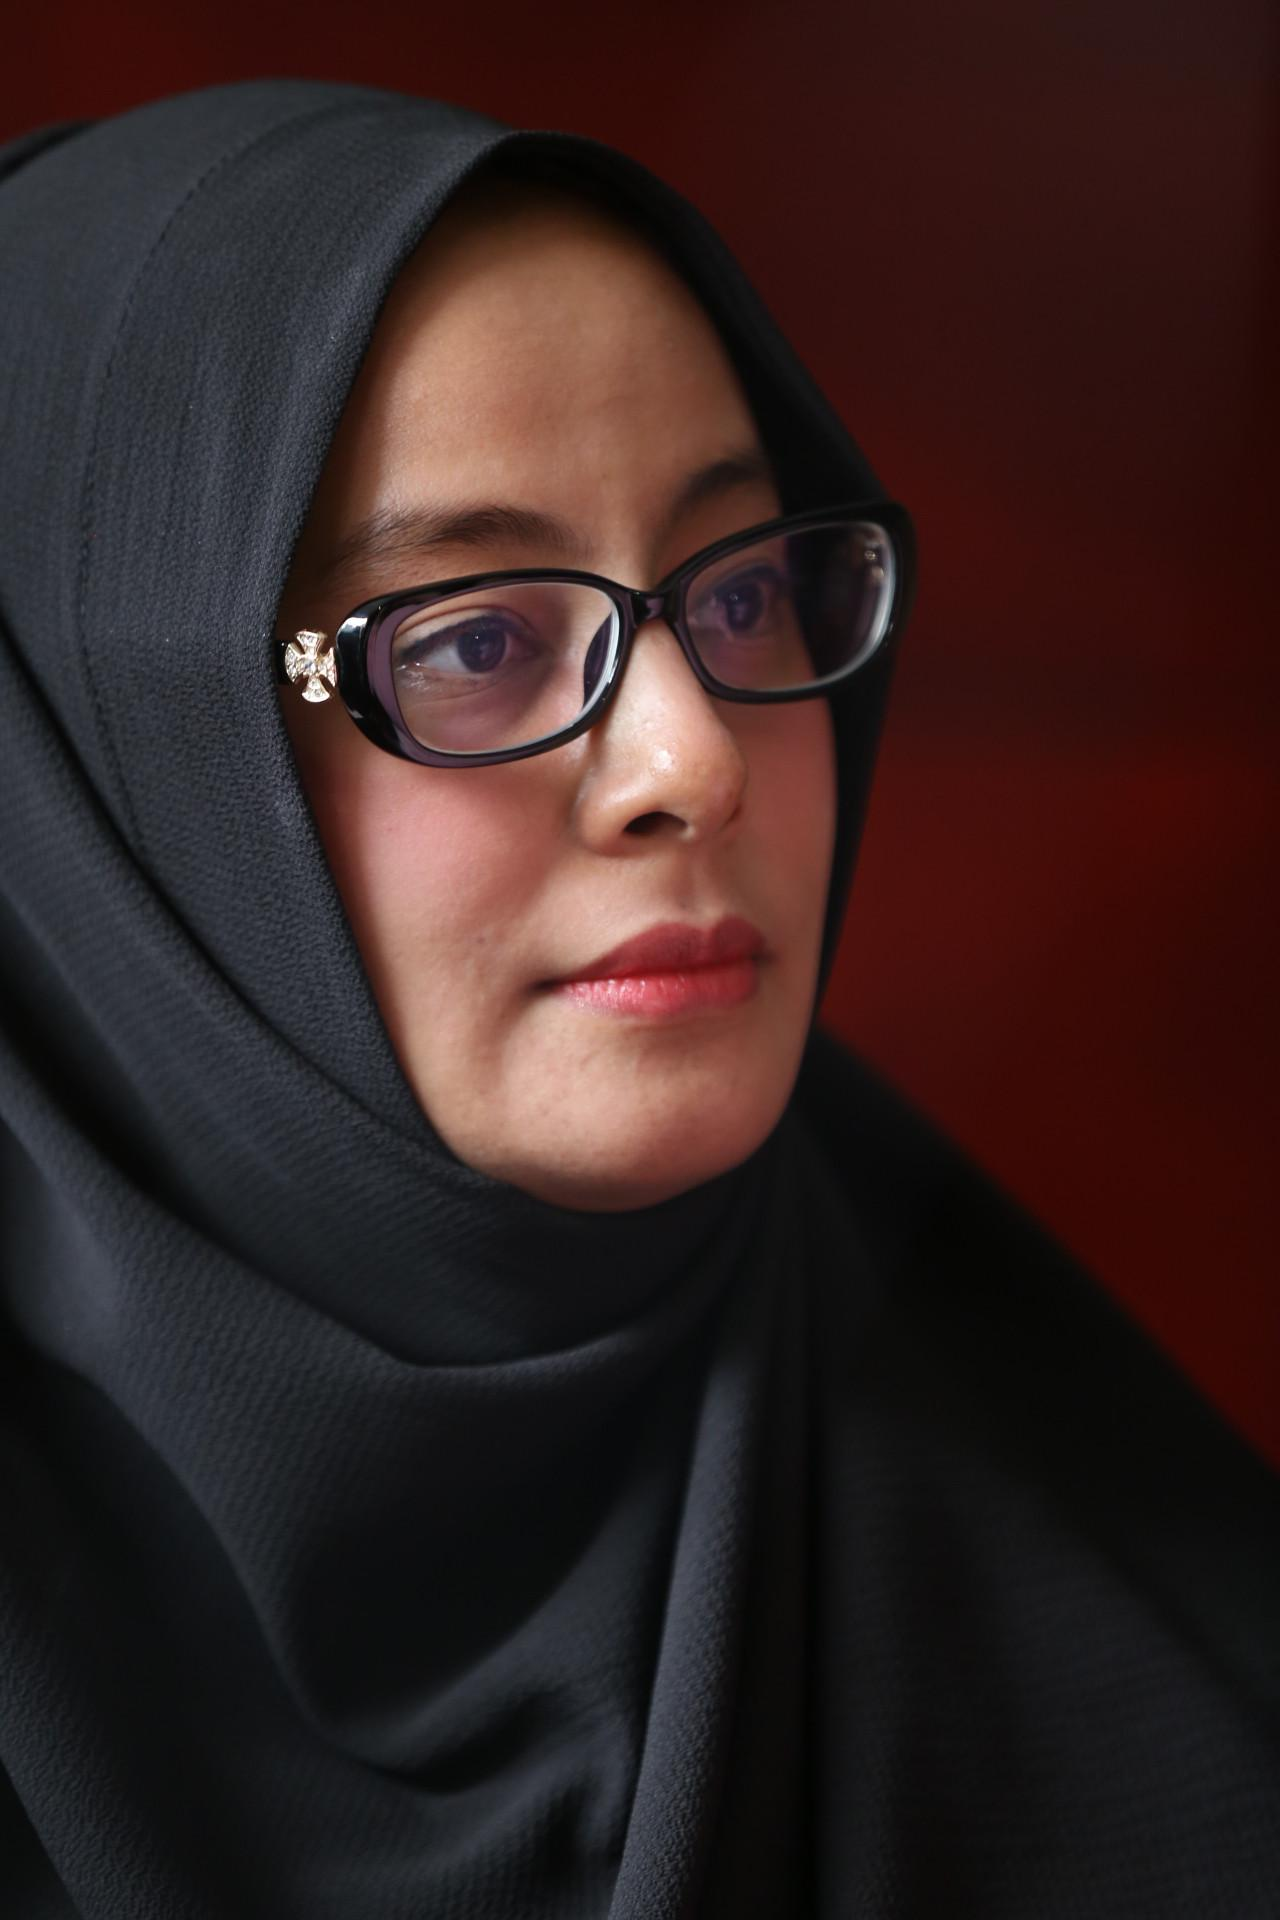 11 Tahun Menikah, Ustaz Ahmad Alhabsyi dan Istri Resmi ...